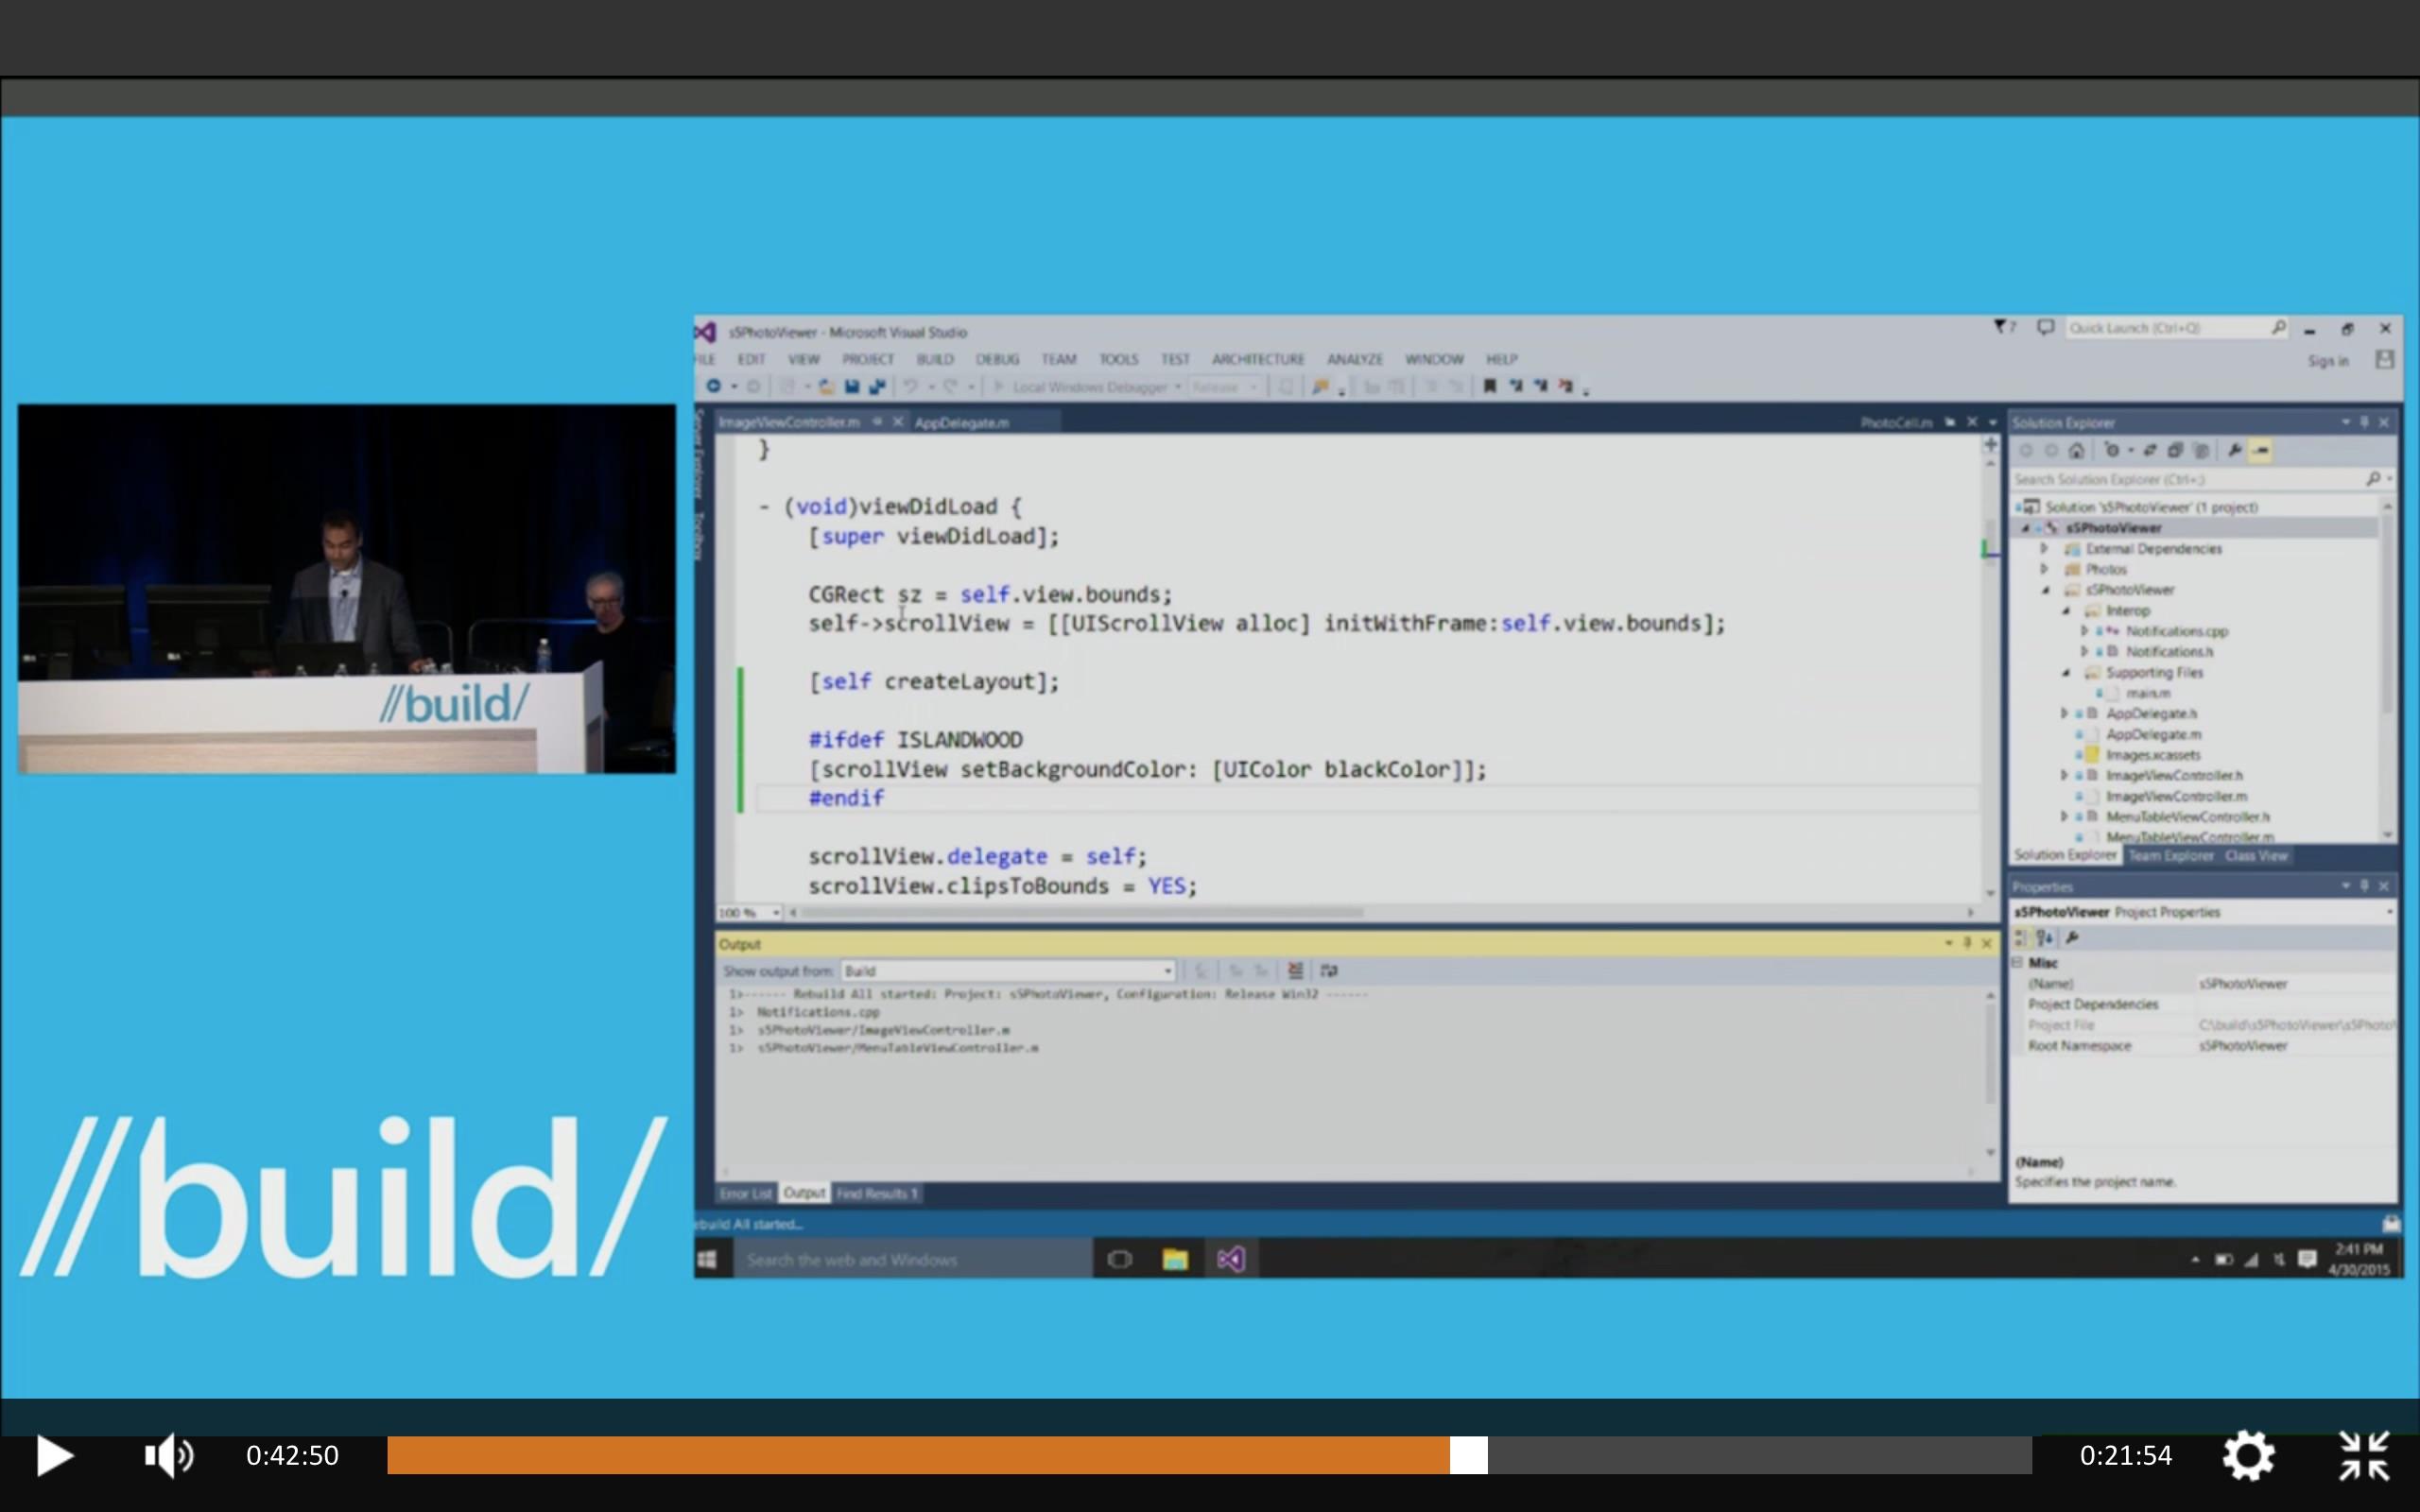 Visual Studio 2015에서 Objective-C 컴파일하는..